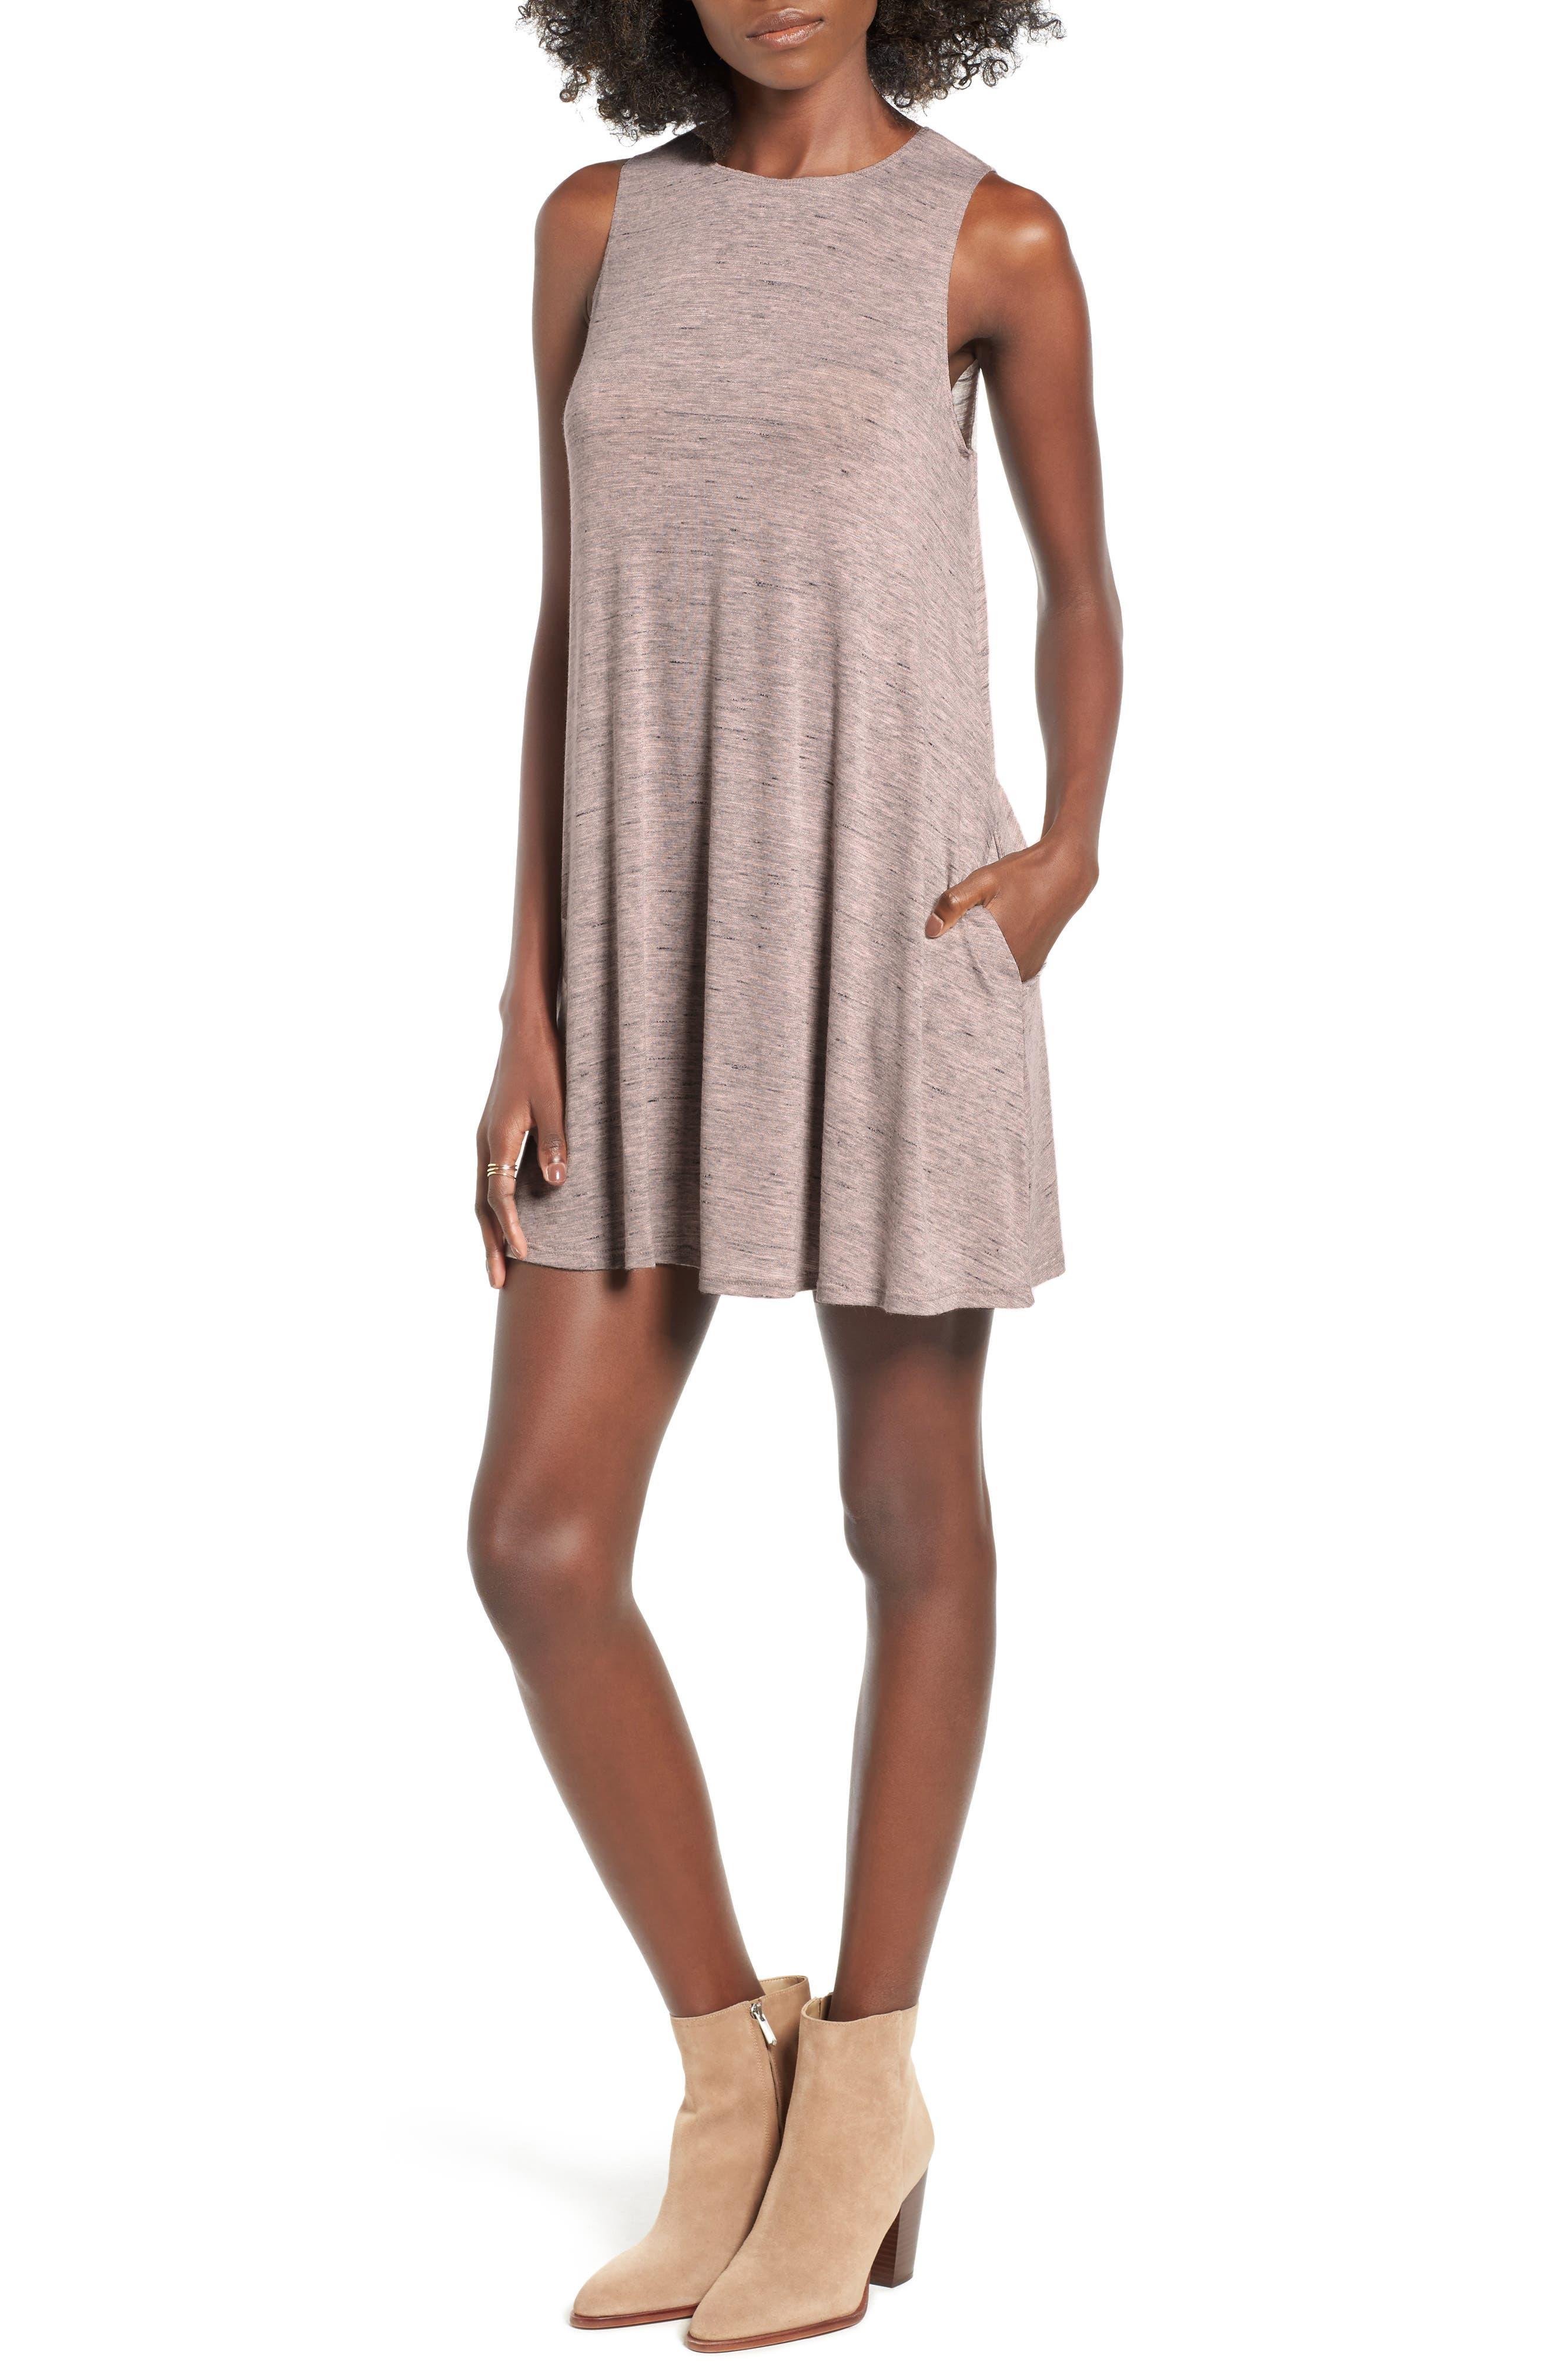 Alternate Image 1 Selected - Socialite High Neck Dress